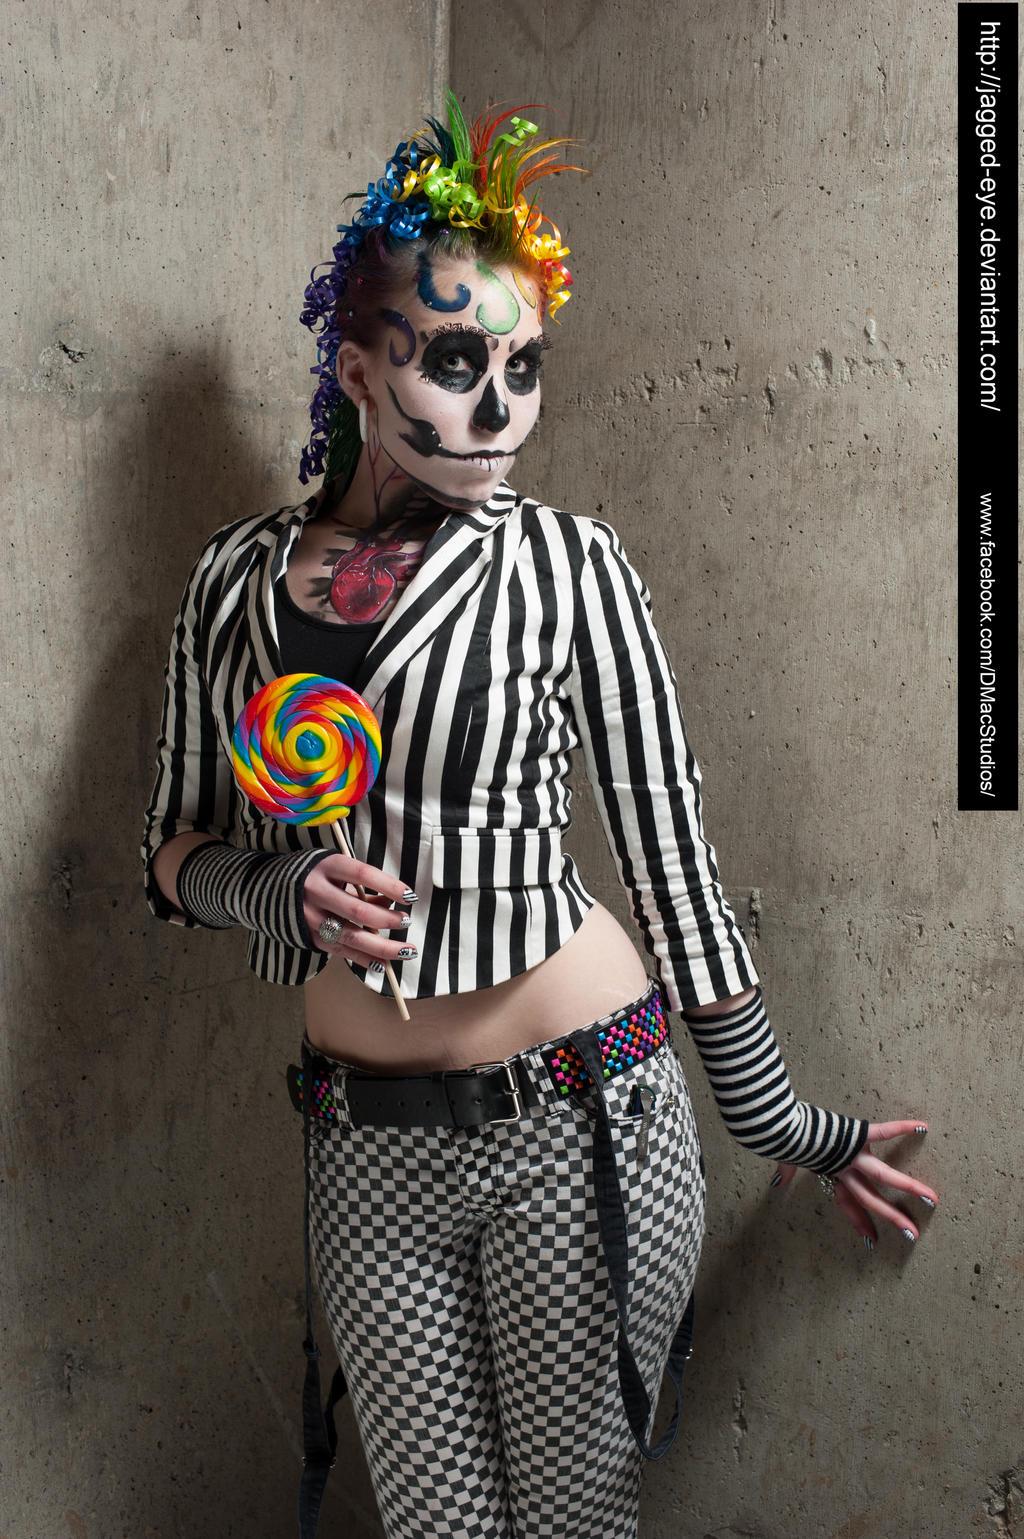 Jodi Candy Clown 1167 By Jagged Eye